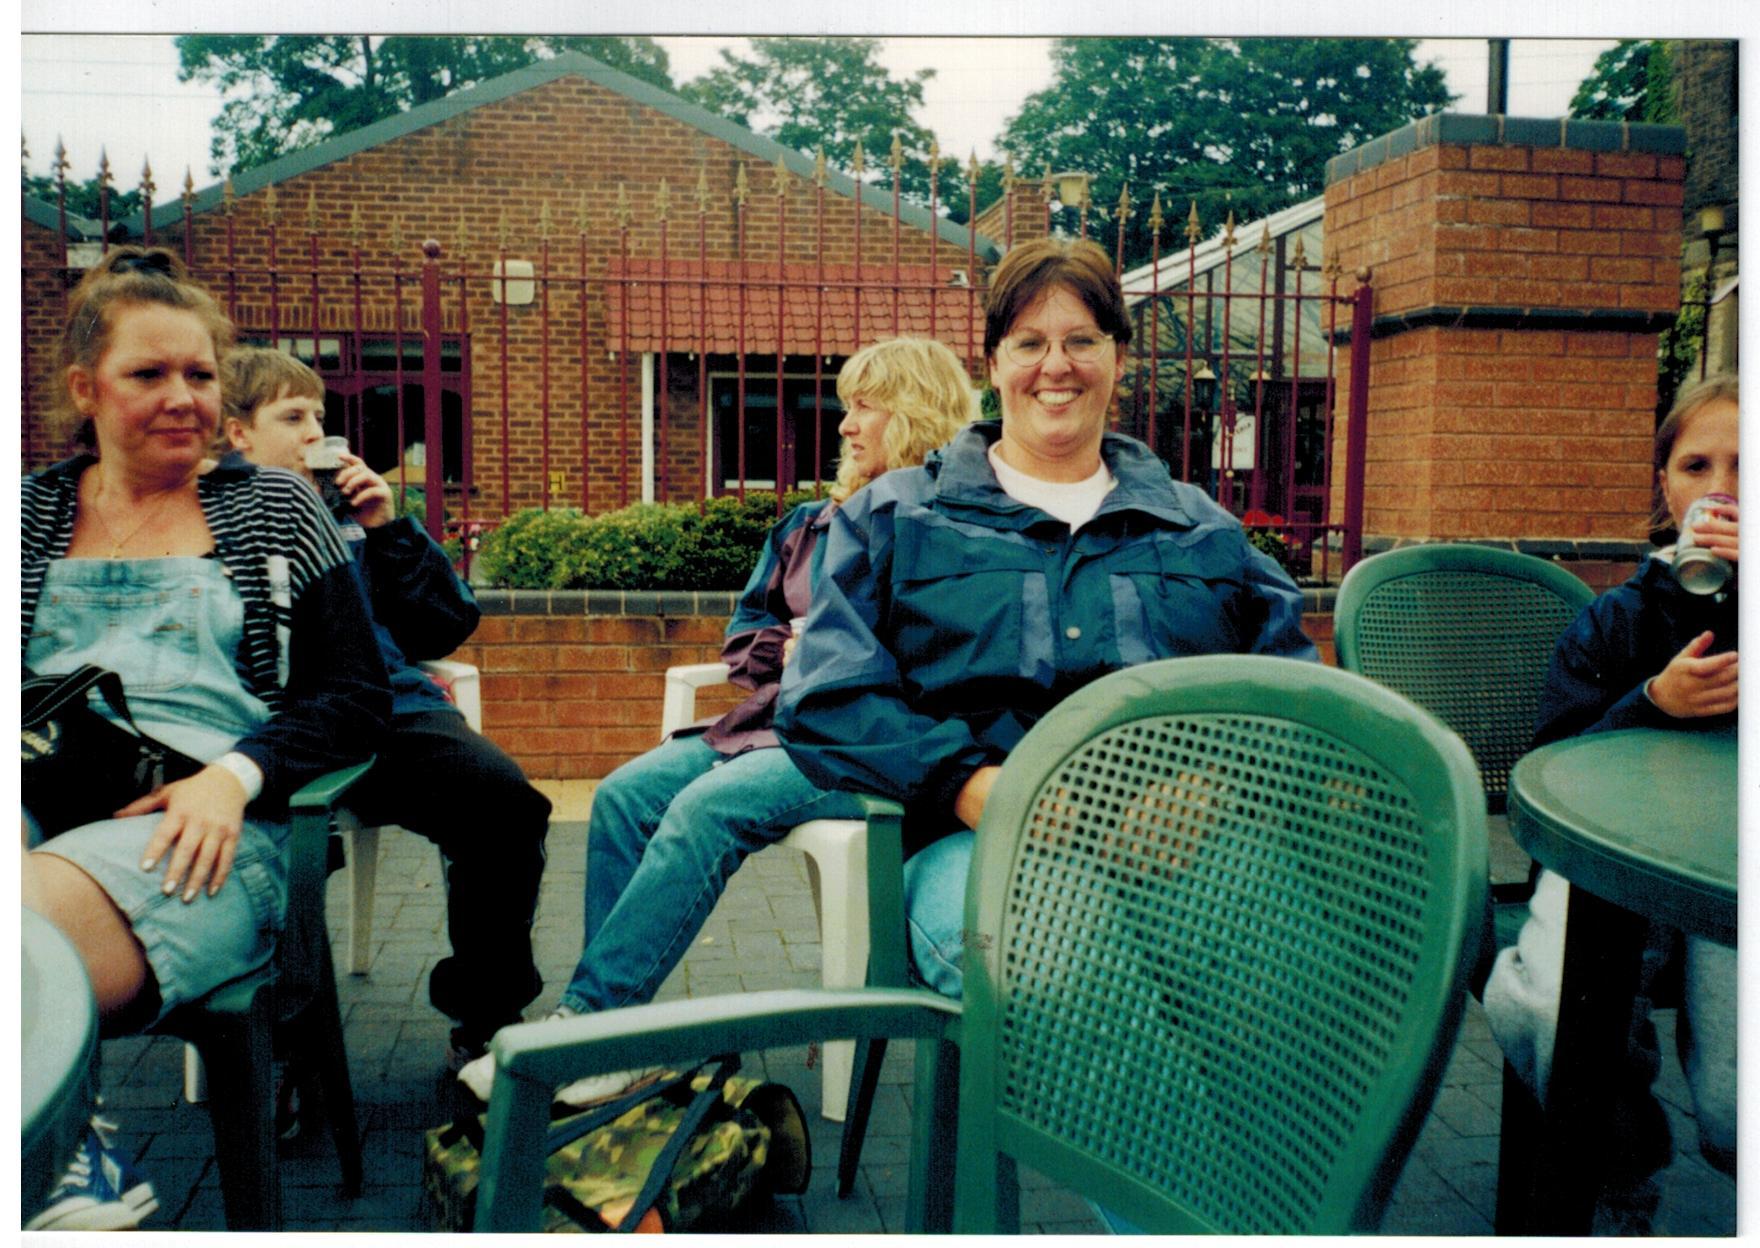 H167_Drayton-Manor-2000